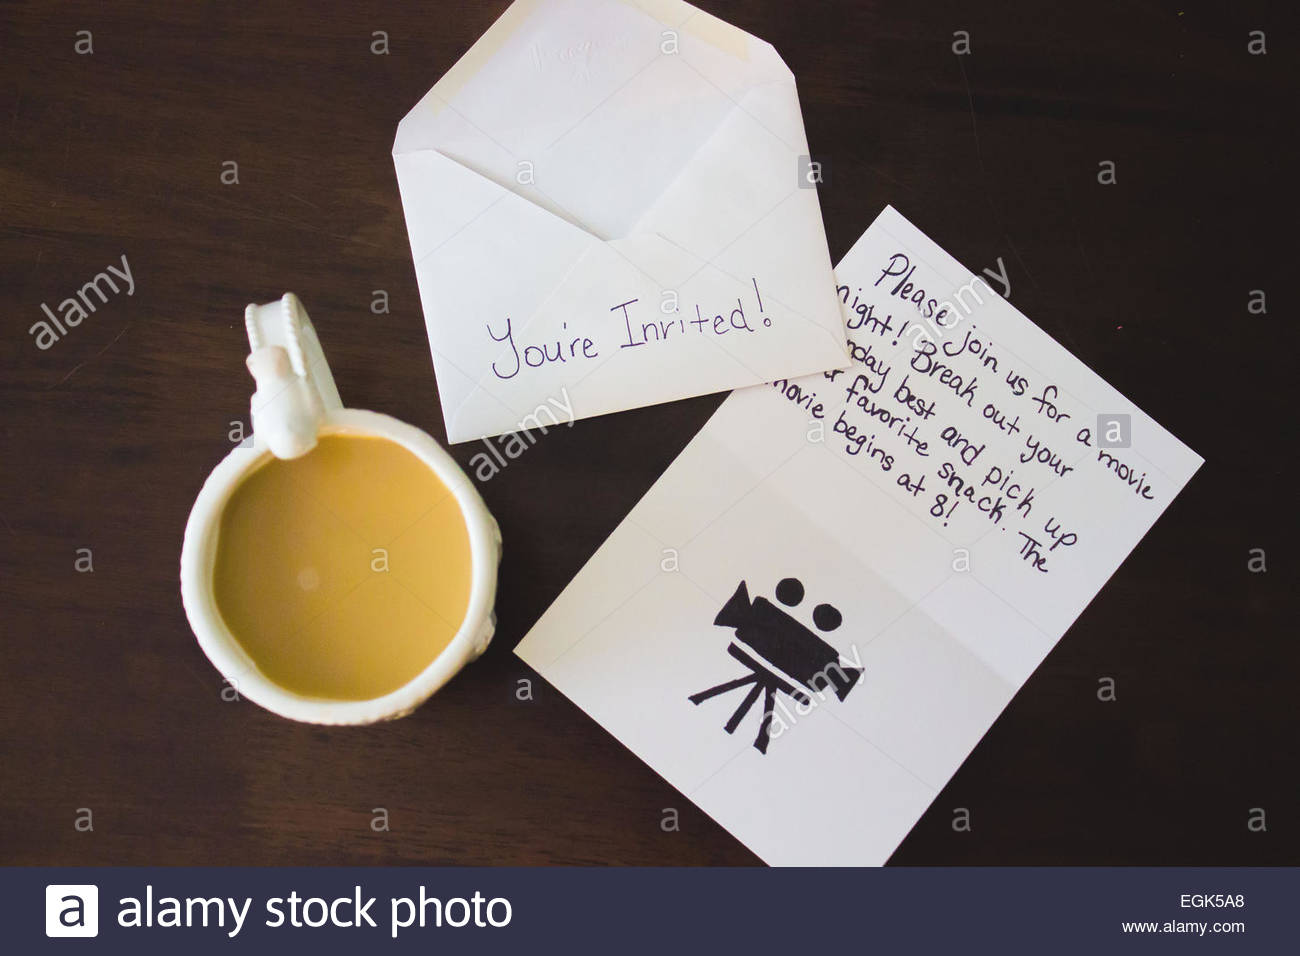 Invitation and coffee - Stock Image